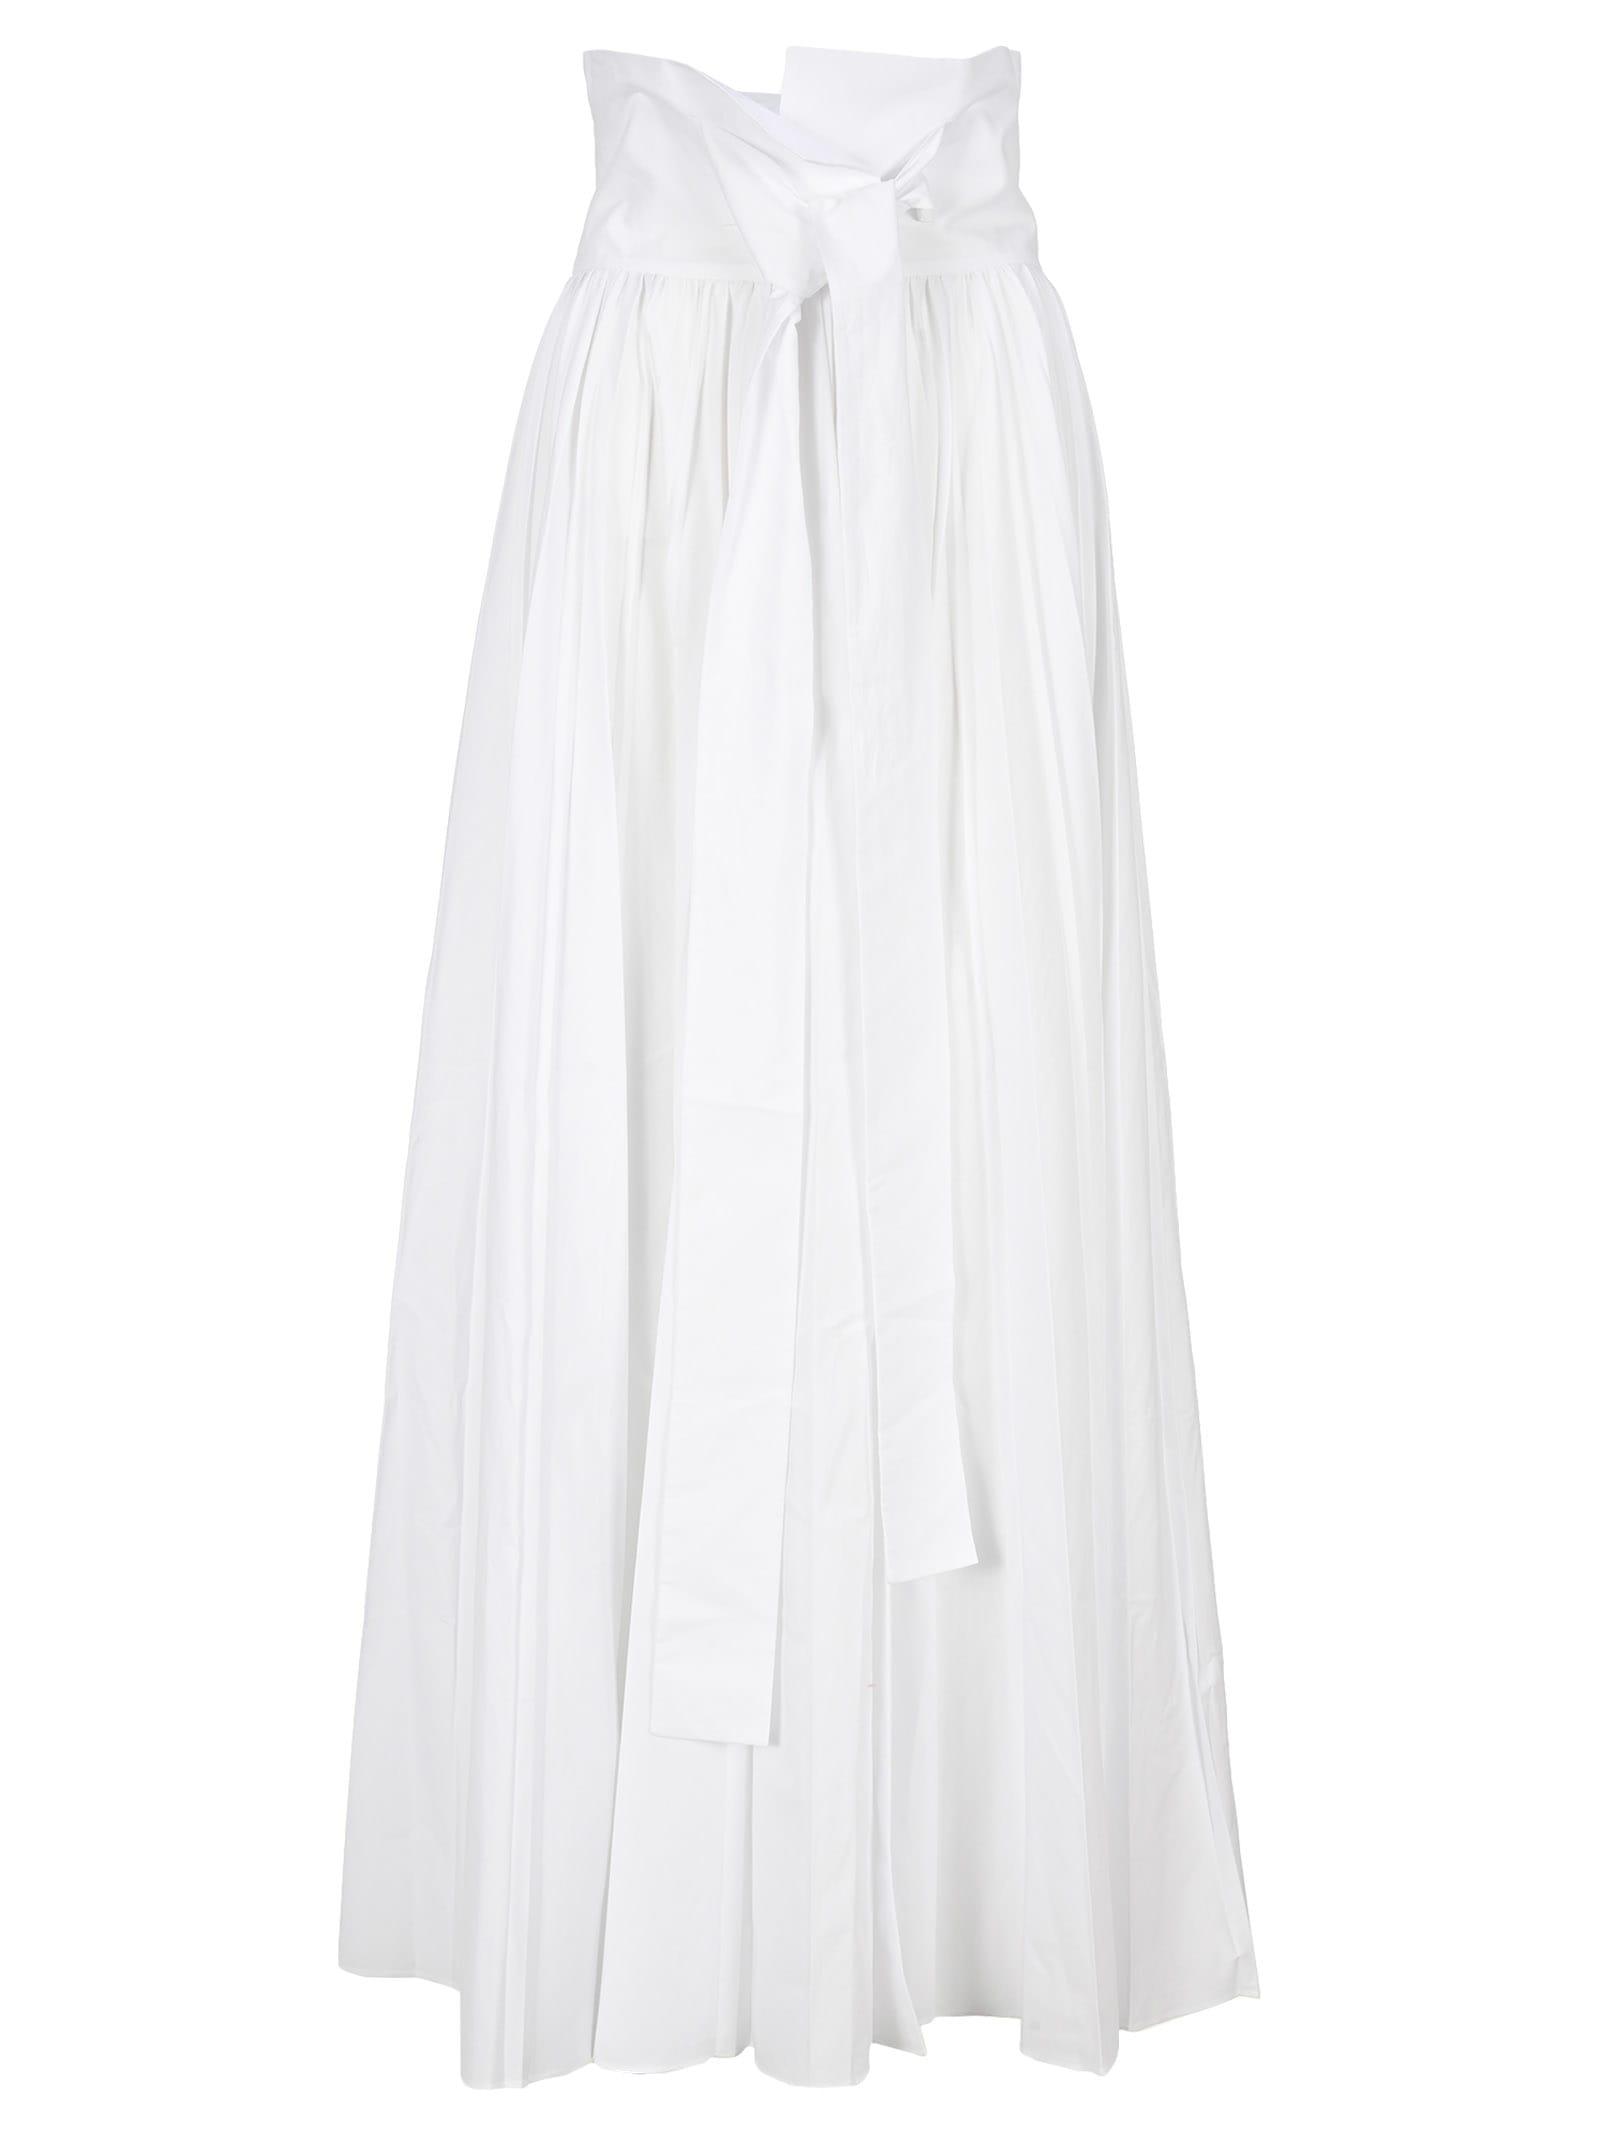 Philosophy Pleated Skirt